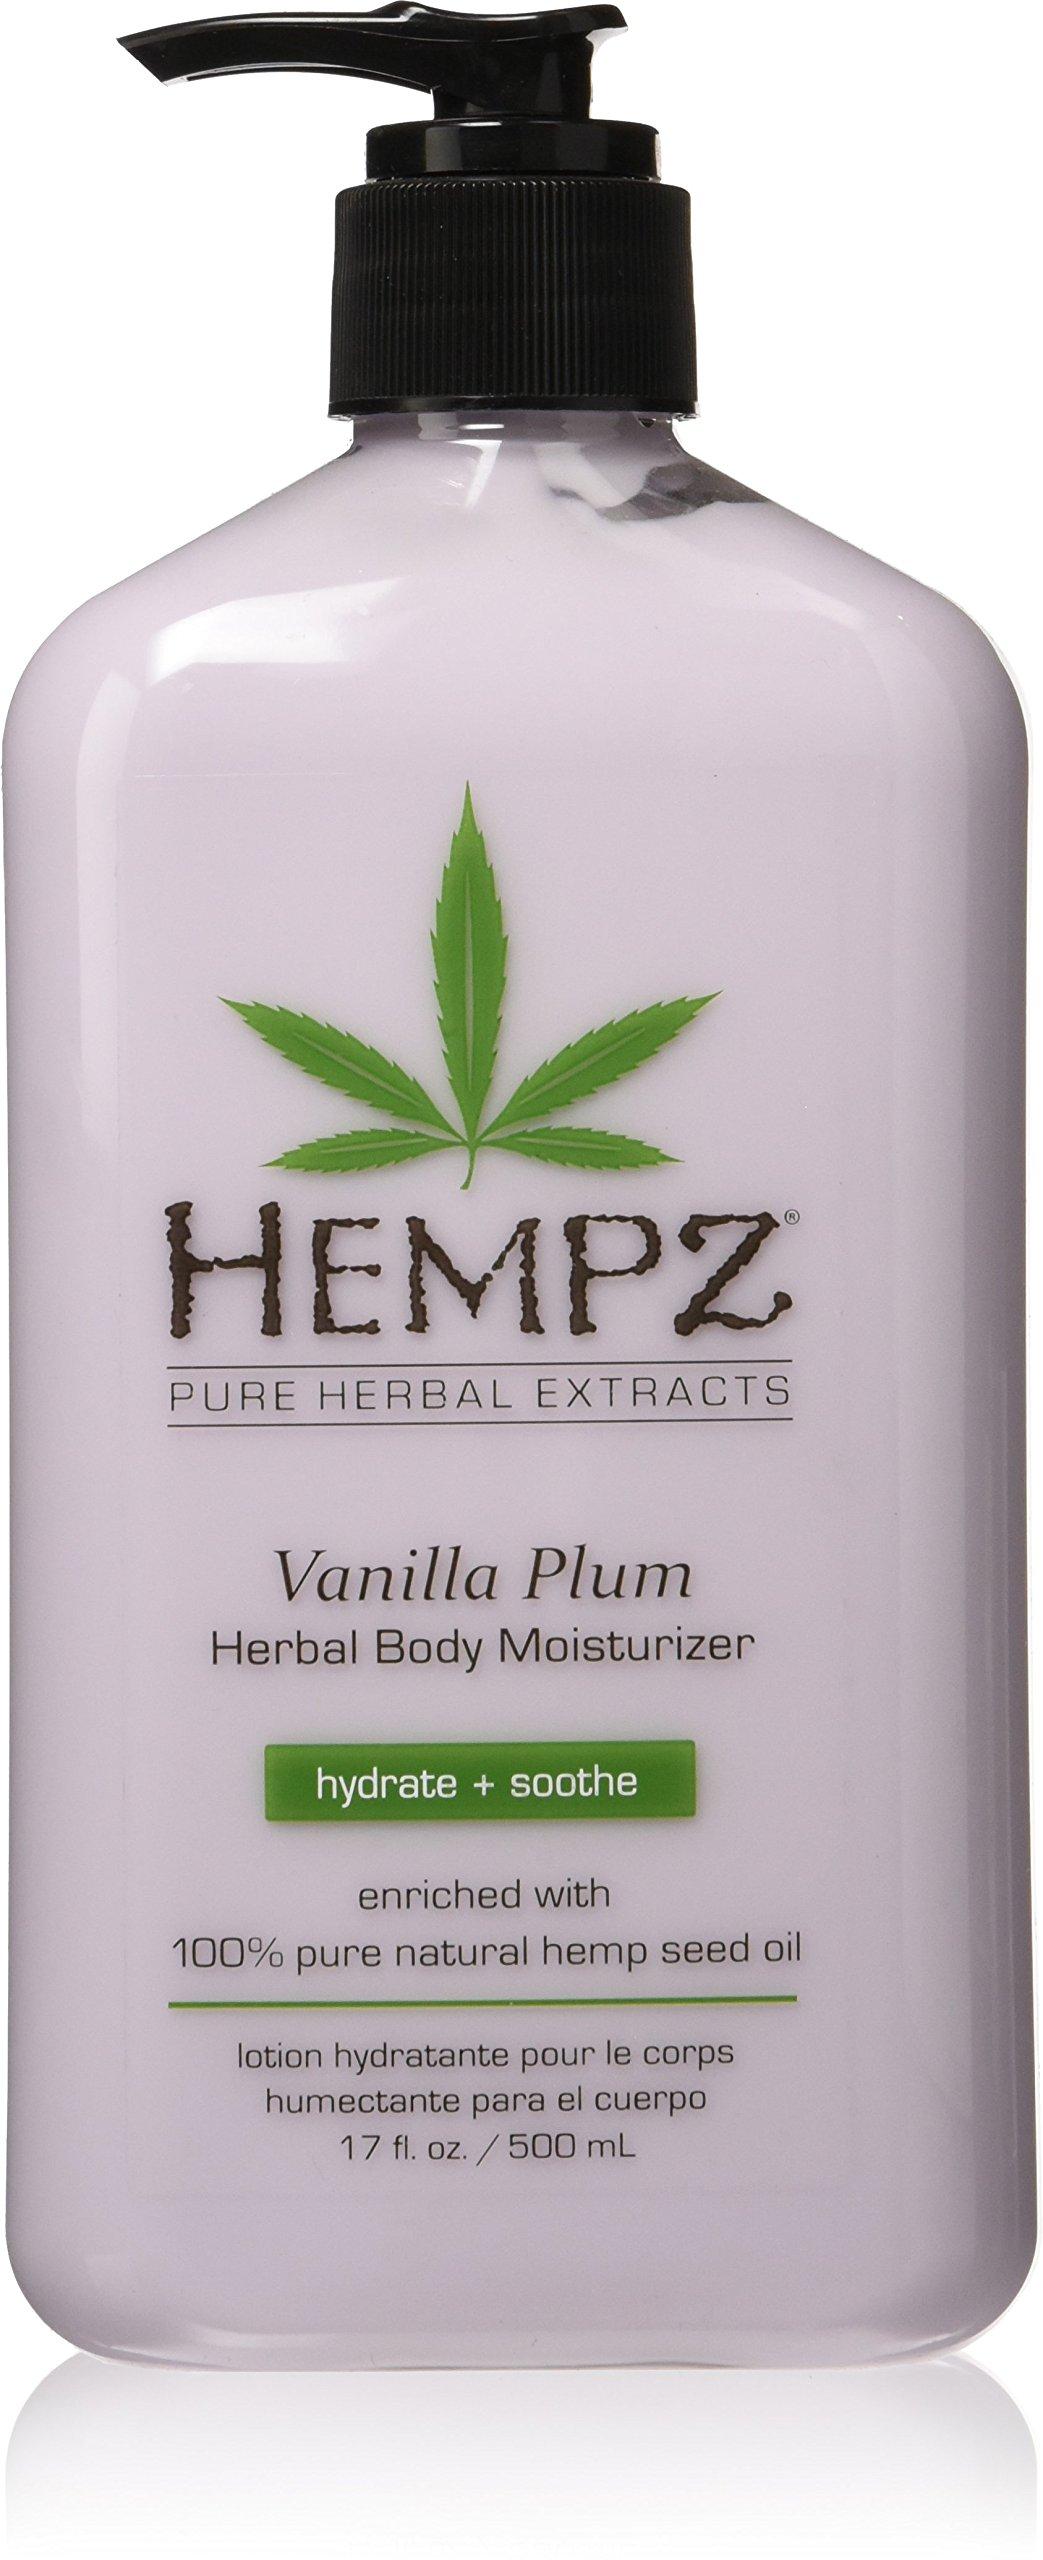 Hempz - Hempz Herbal Body Moisturizer, Light Purple, Vanilla Plum, 17 Fluid Ounce